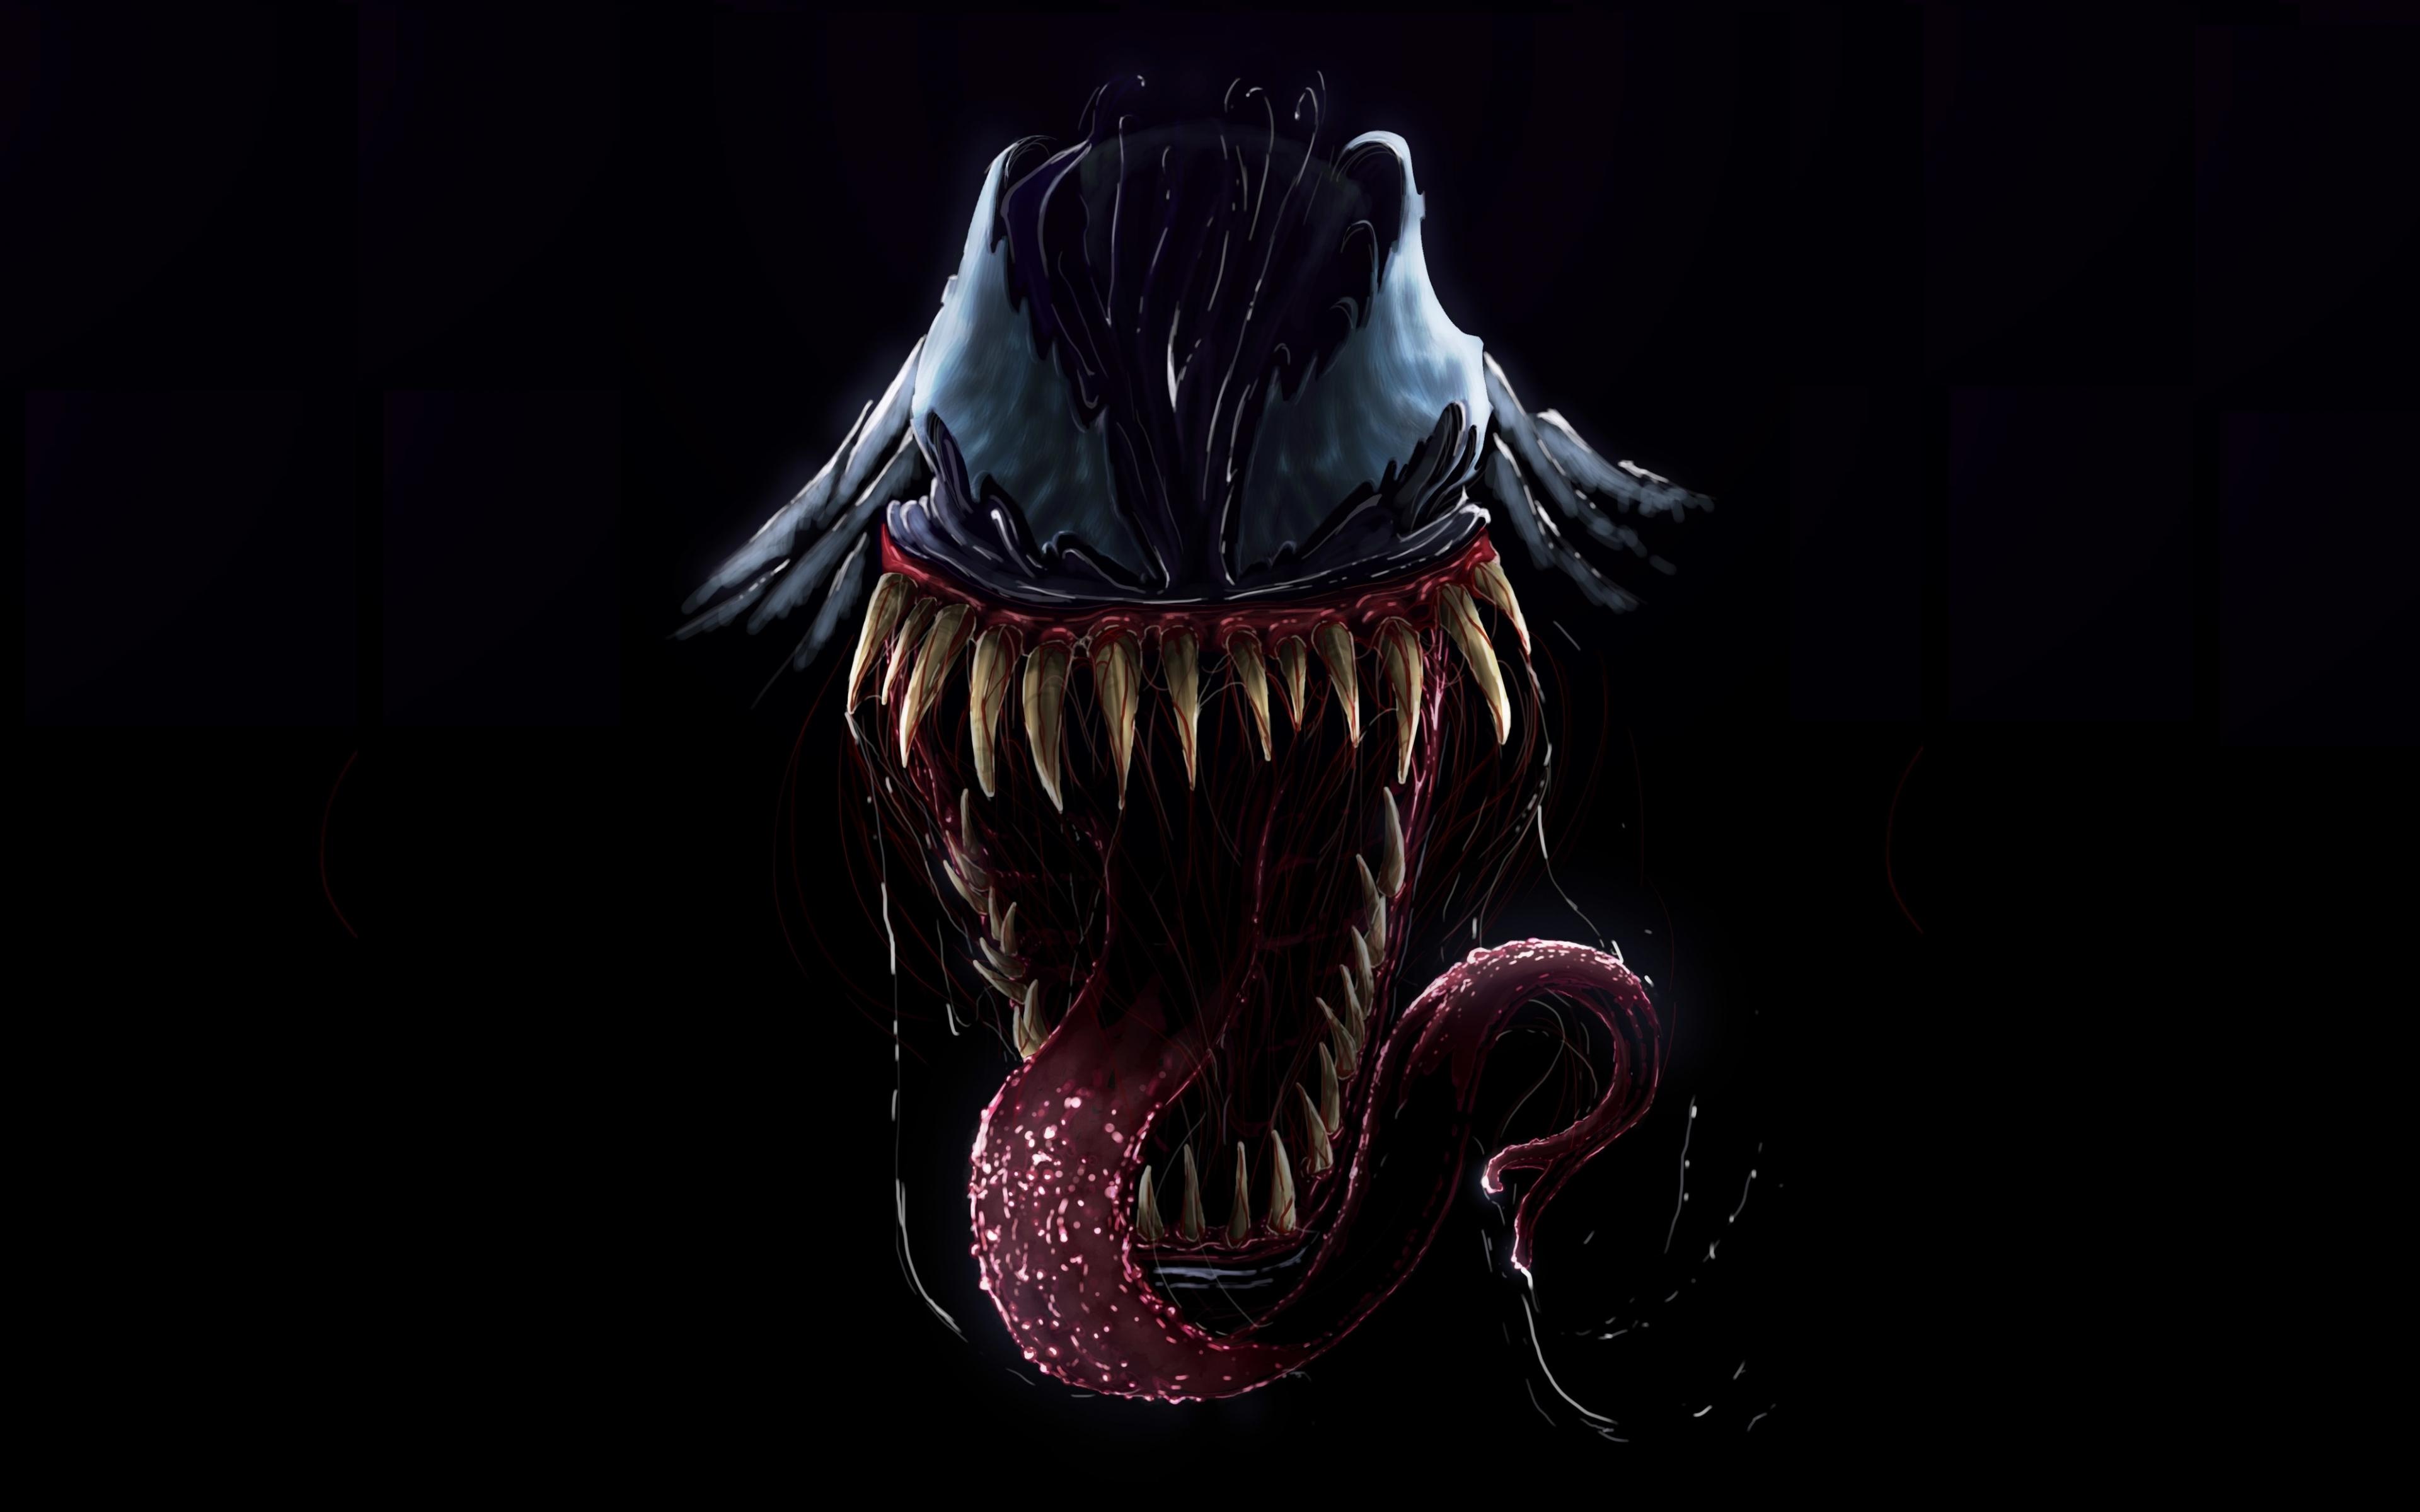 Download 3840x2400 Wallpaper Artwork Villain Venom 4k Ultra Hd 16 10 Widescreen 3840x2400 Hd Image Background 8637